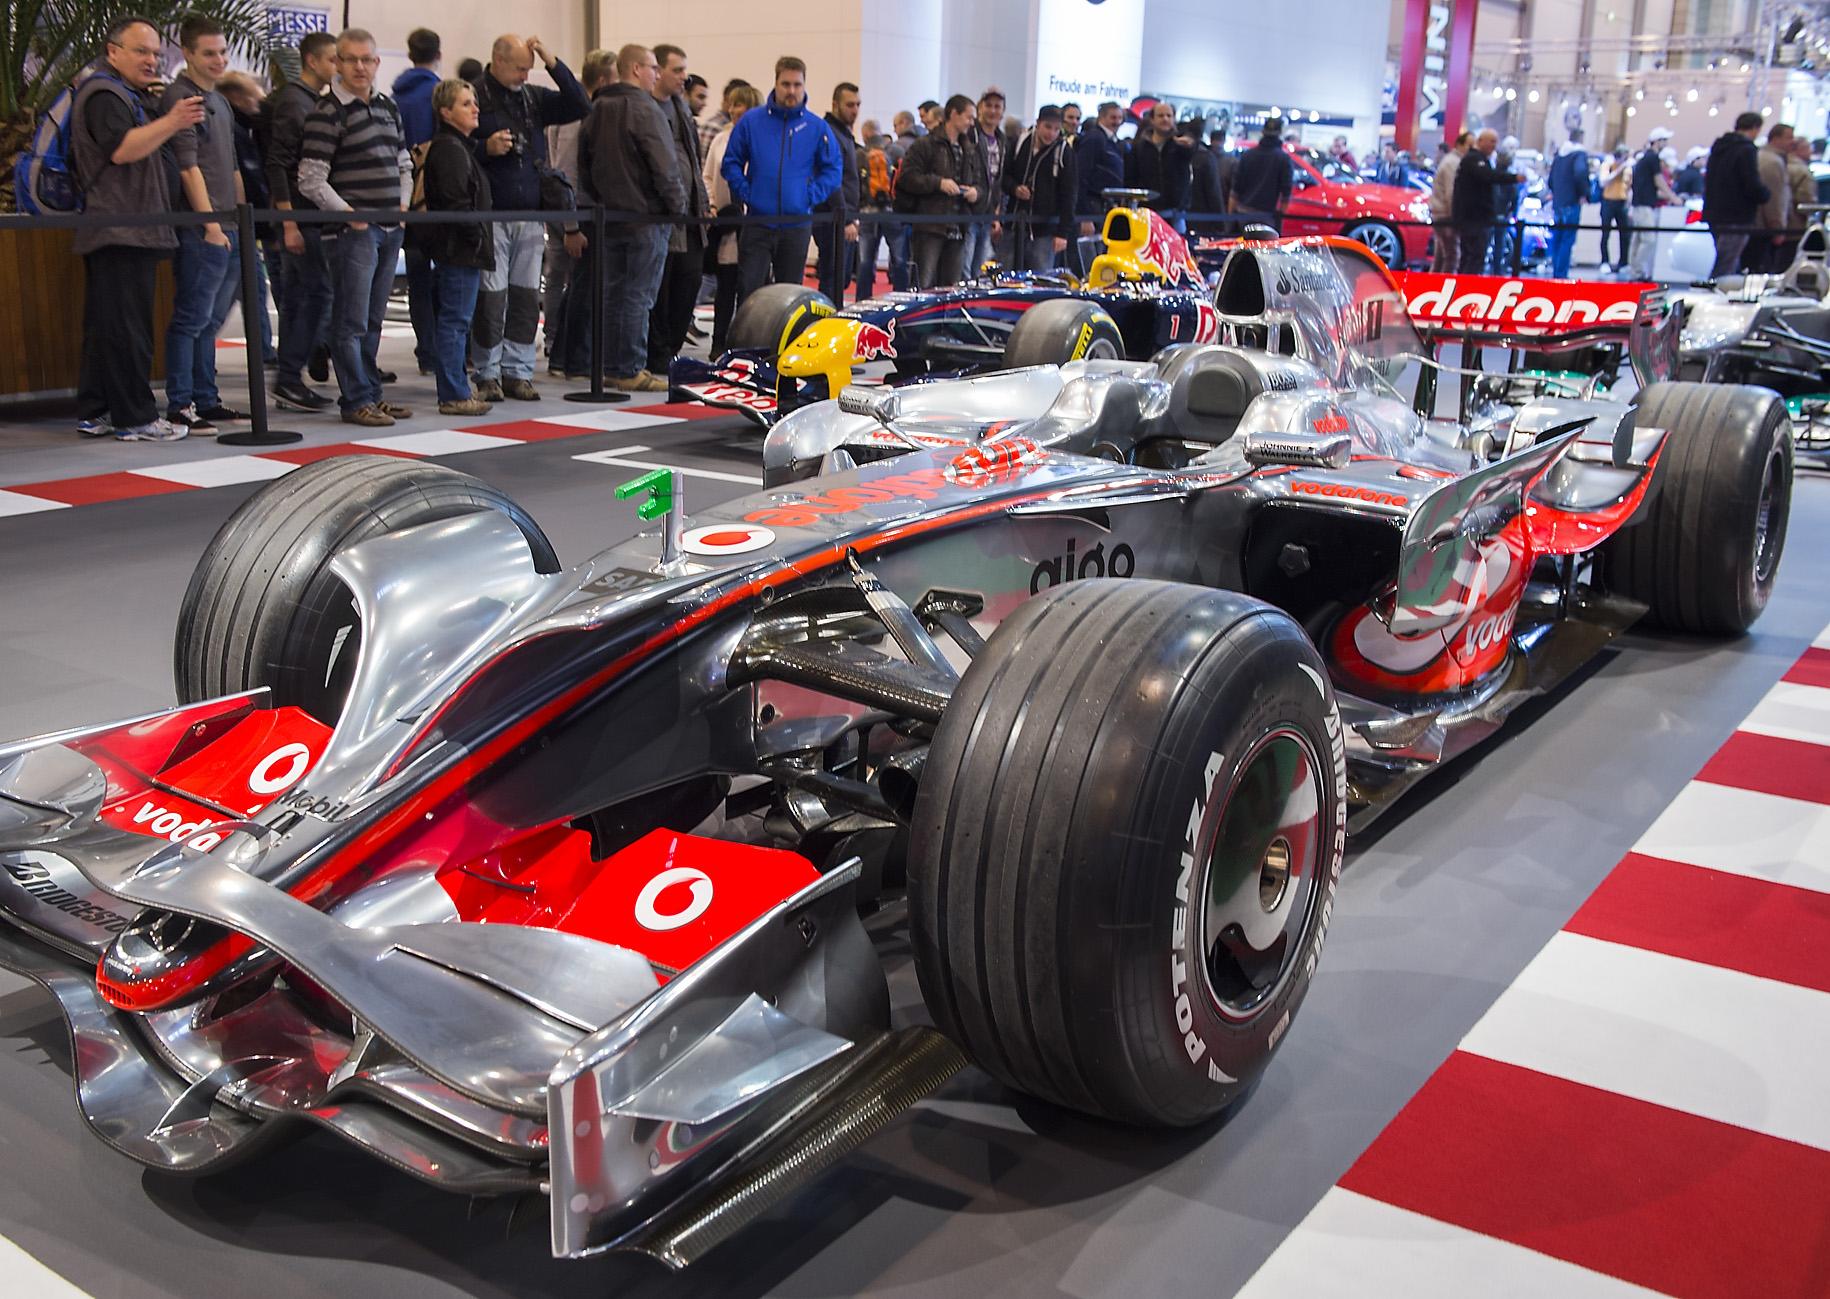 2015 - Essen Motor Show